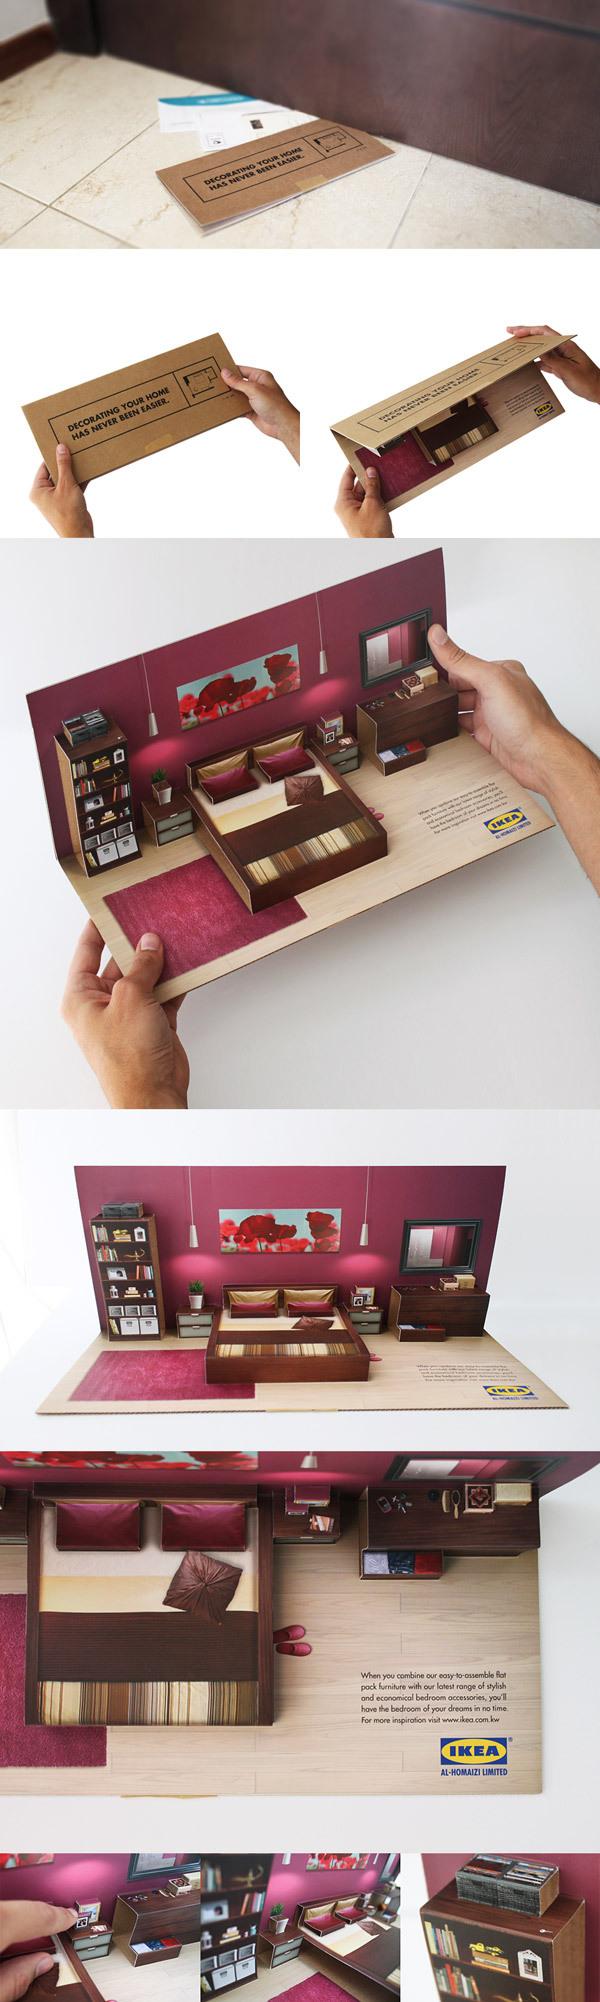 DIY Advantages Of Flat Pack Furniture Wooden PDF woodworking 5